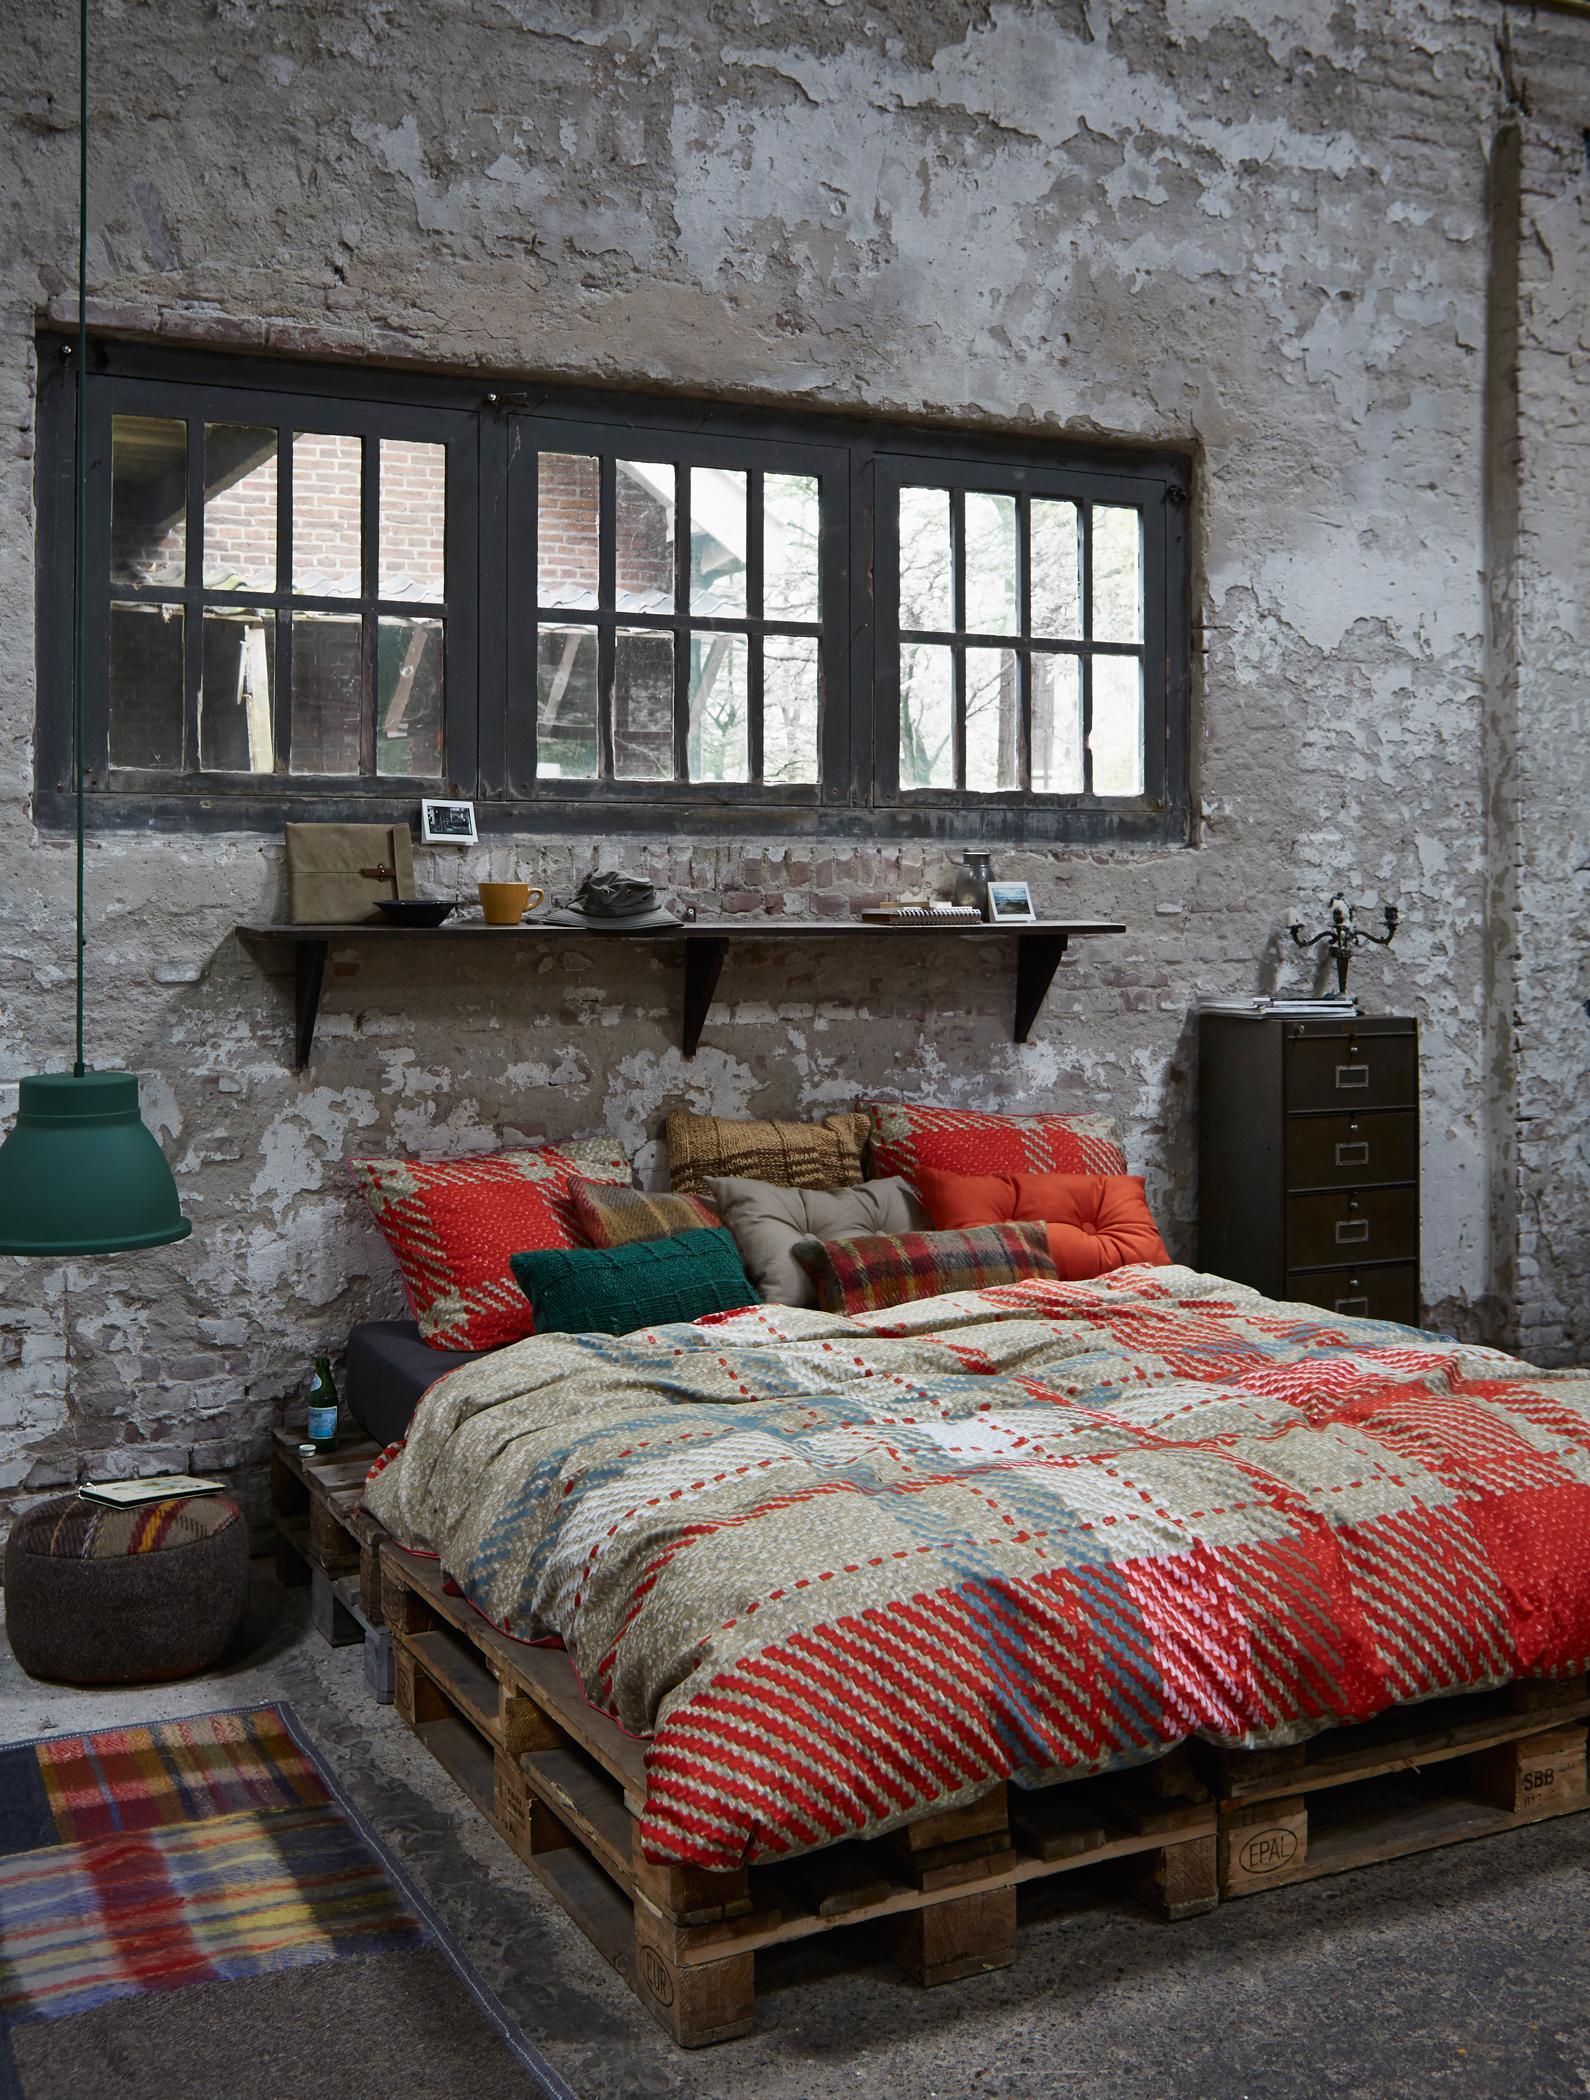 Palettenbett bilder ideen couchstyle for Bett industriedesign